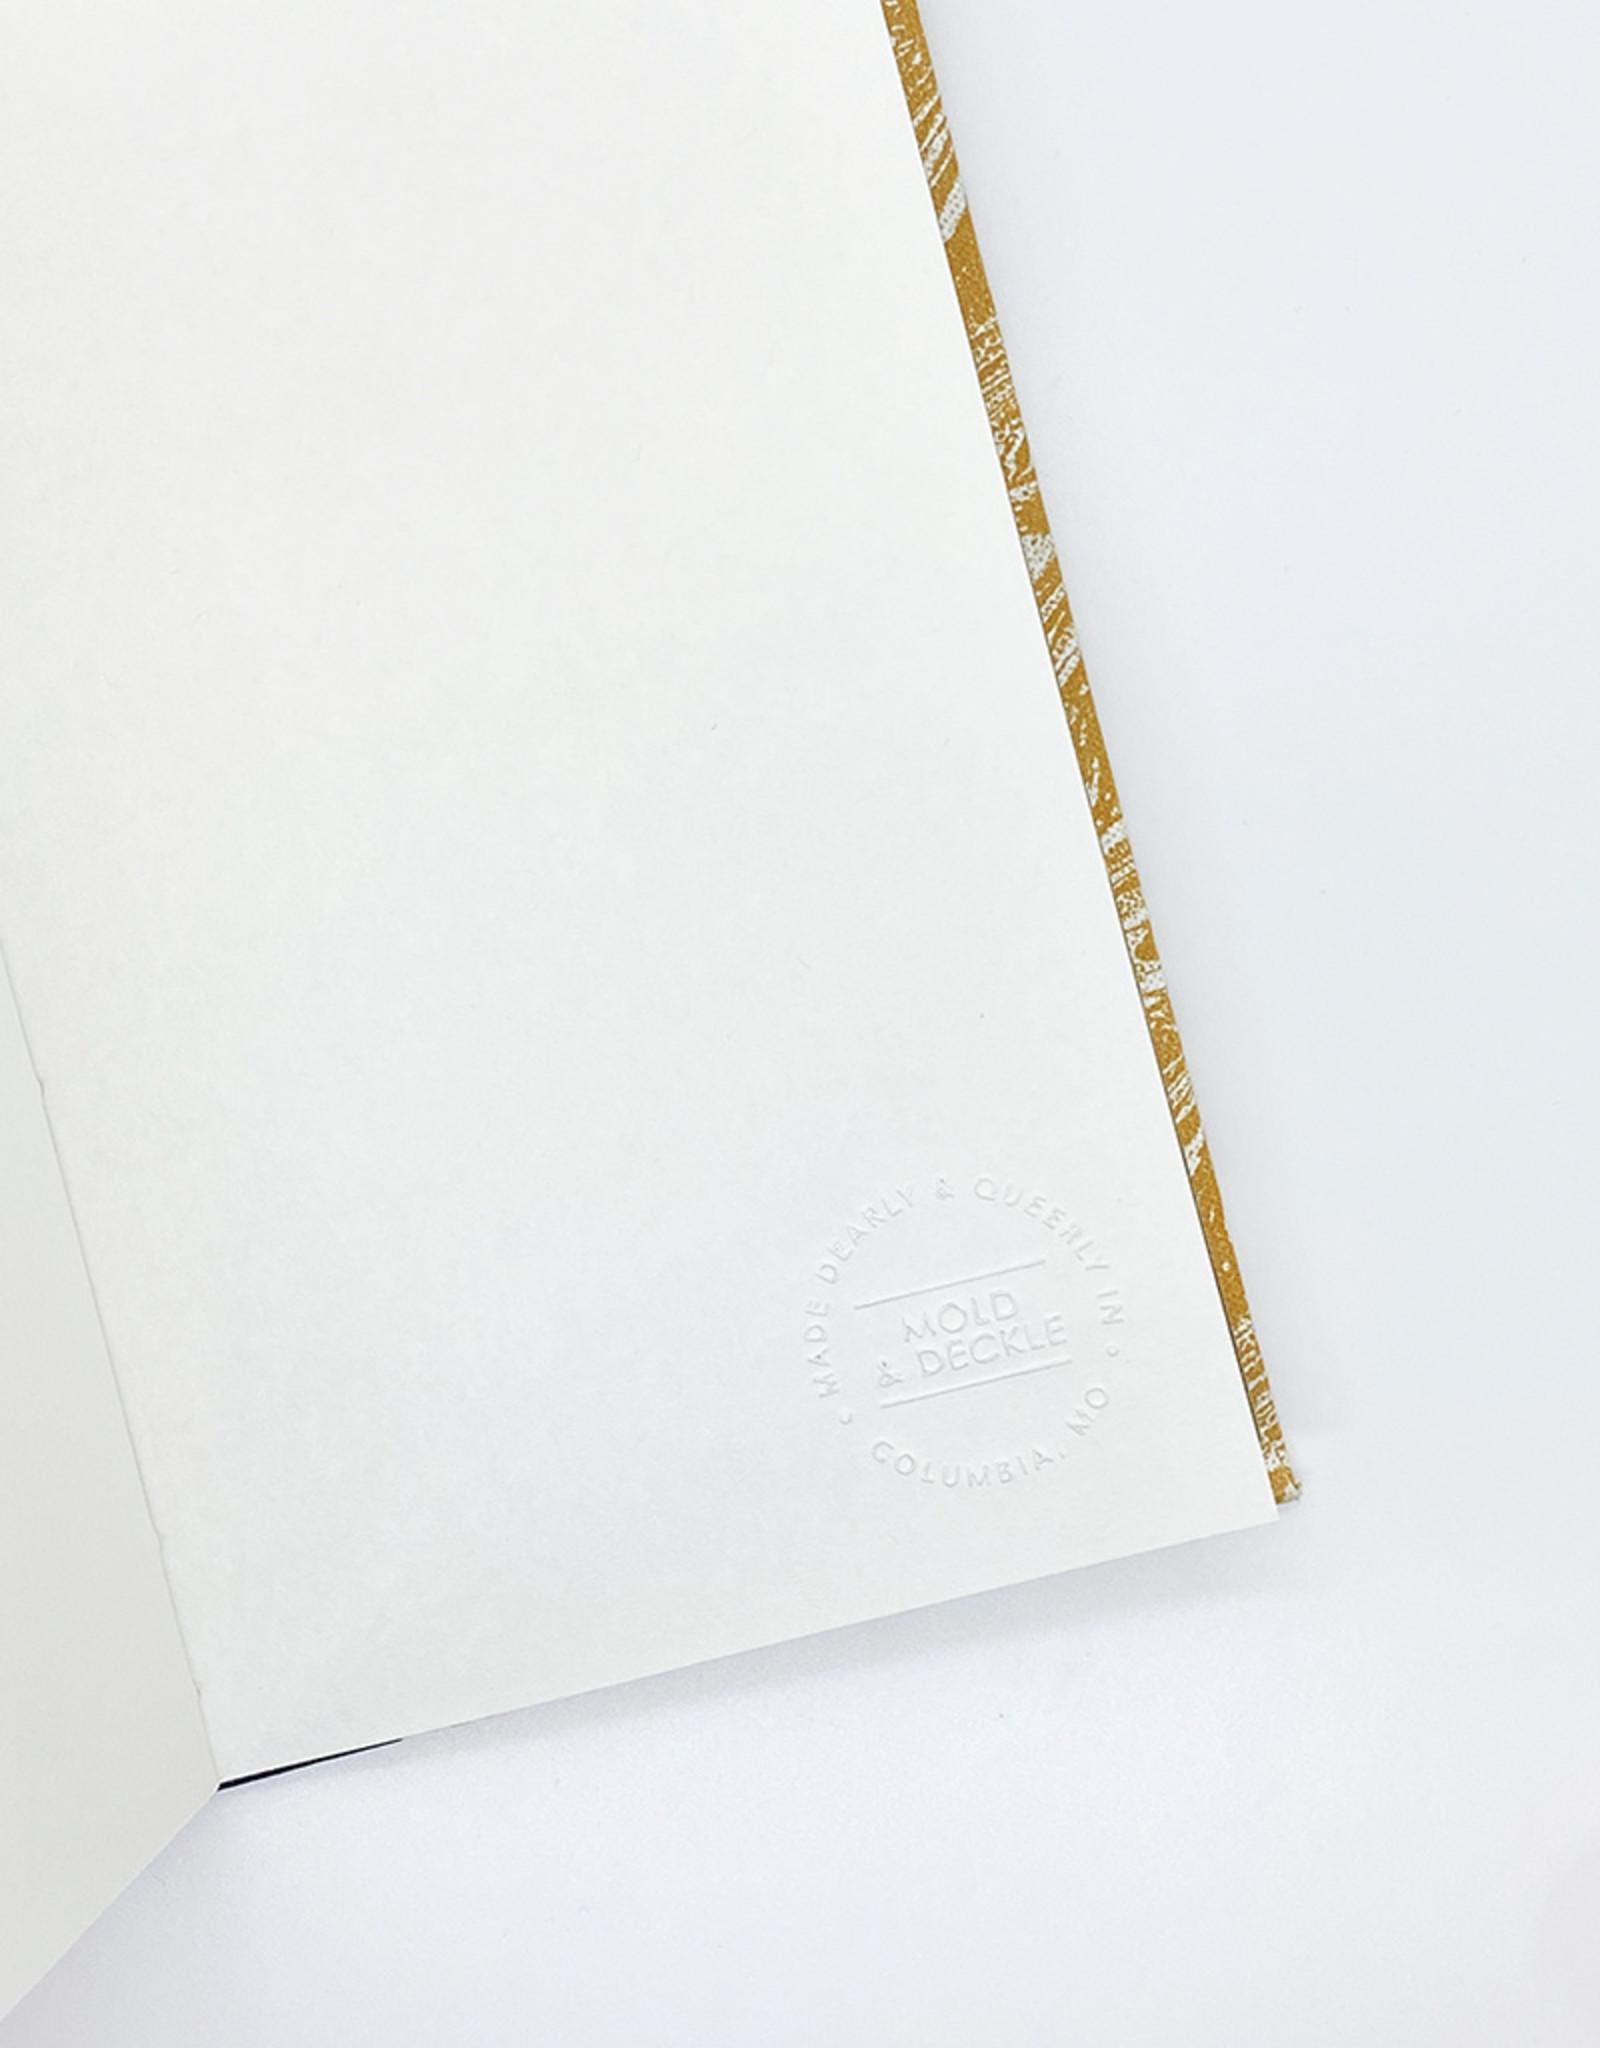 Mold & Deckle Green + Gold Flora // Sketch